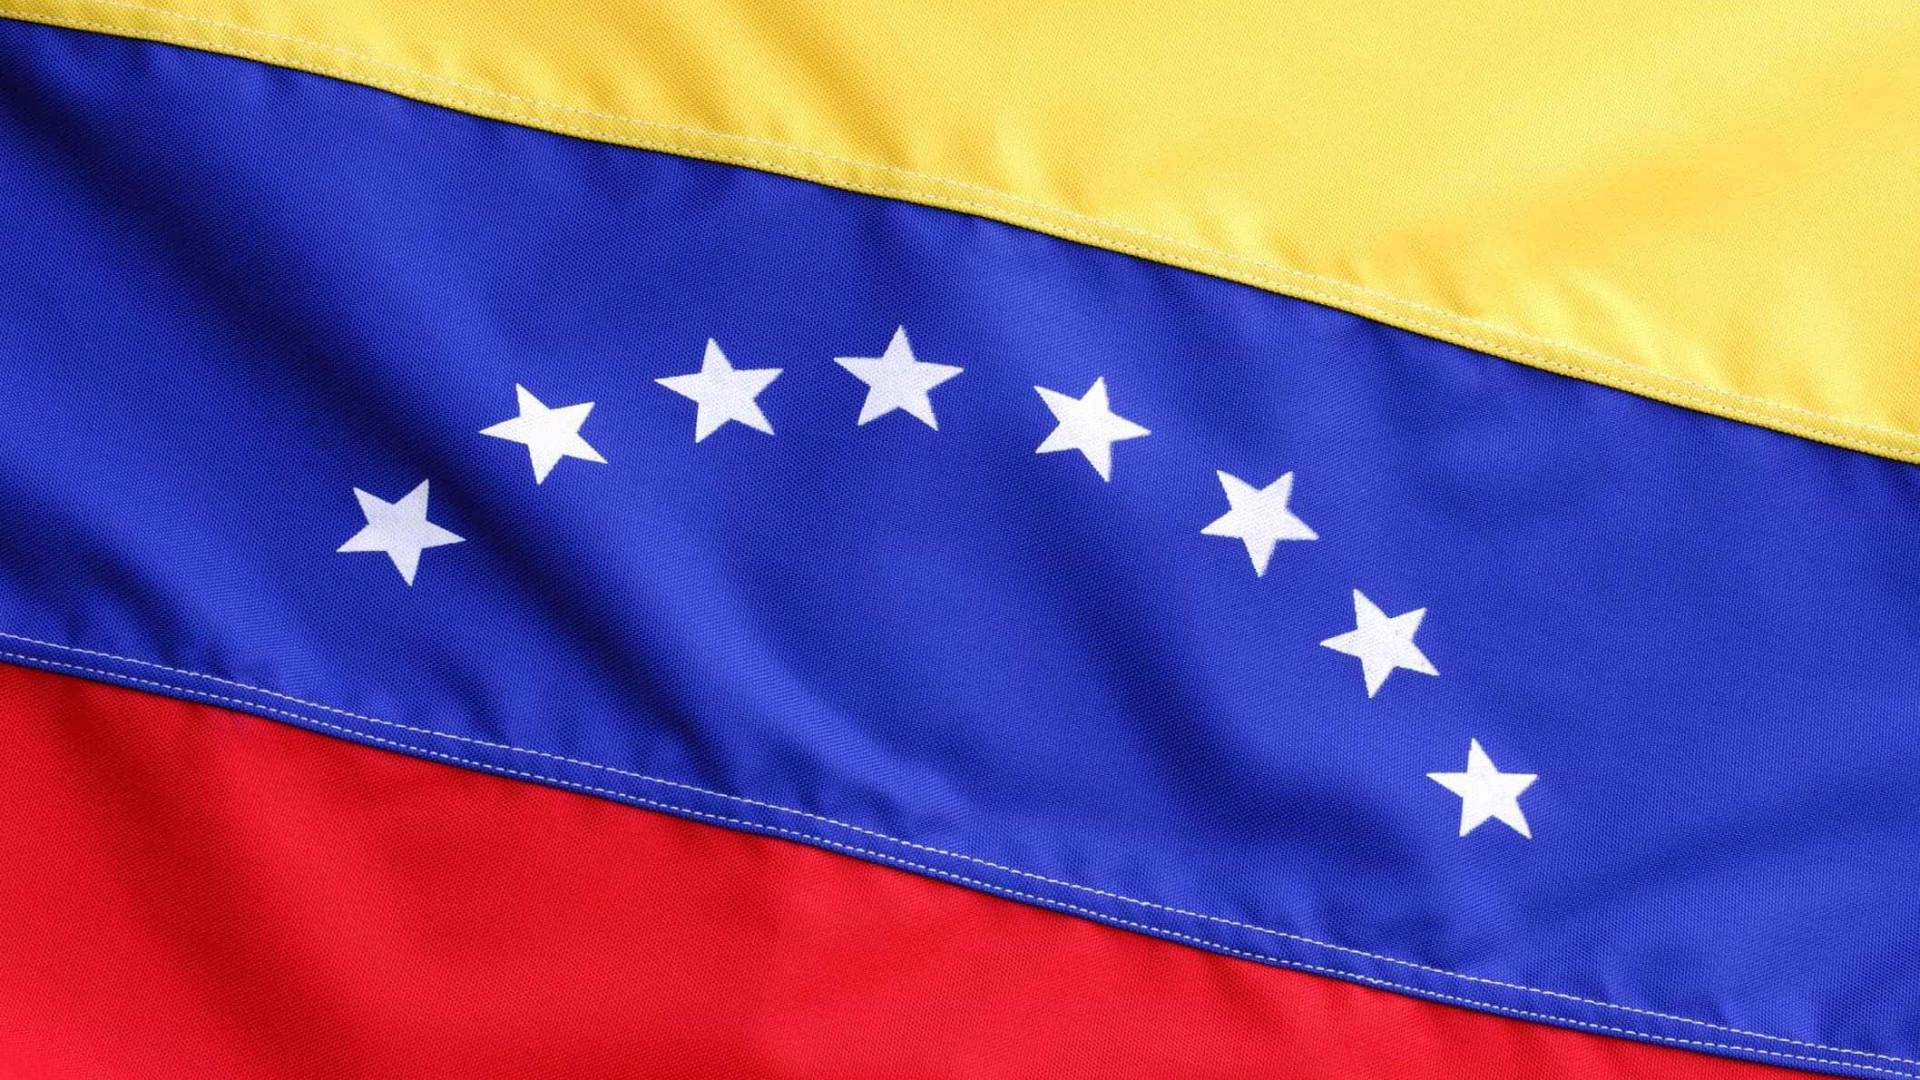 Venezuela: Oito detidos por desvio de verbas do Ministério de Finanças